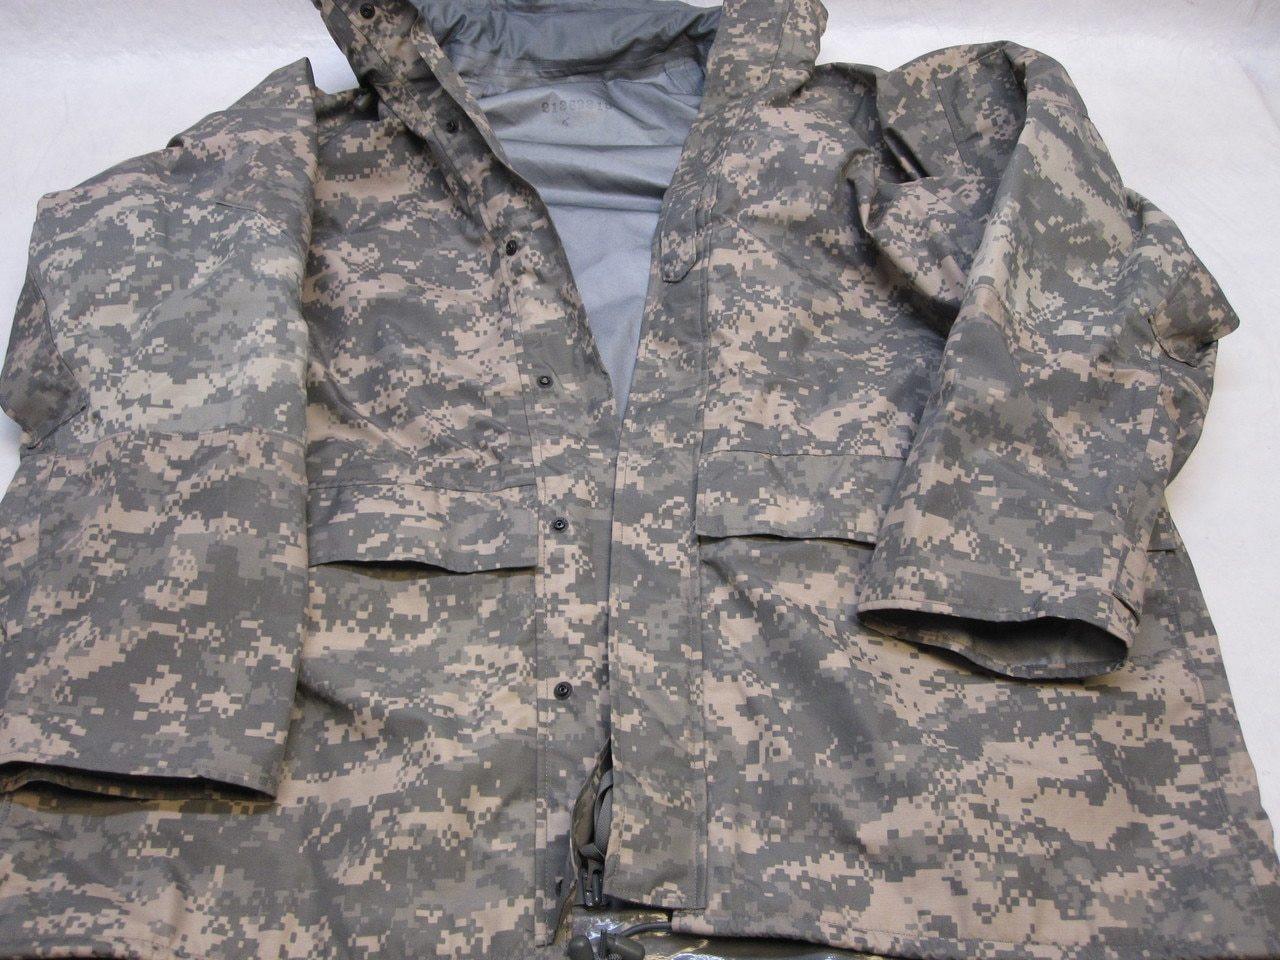 ARMY ACU DIGITAL GEN 2 GORE-TEX JACKET MEDIUM/LONG PARKA COLD/WET b0